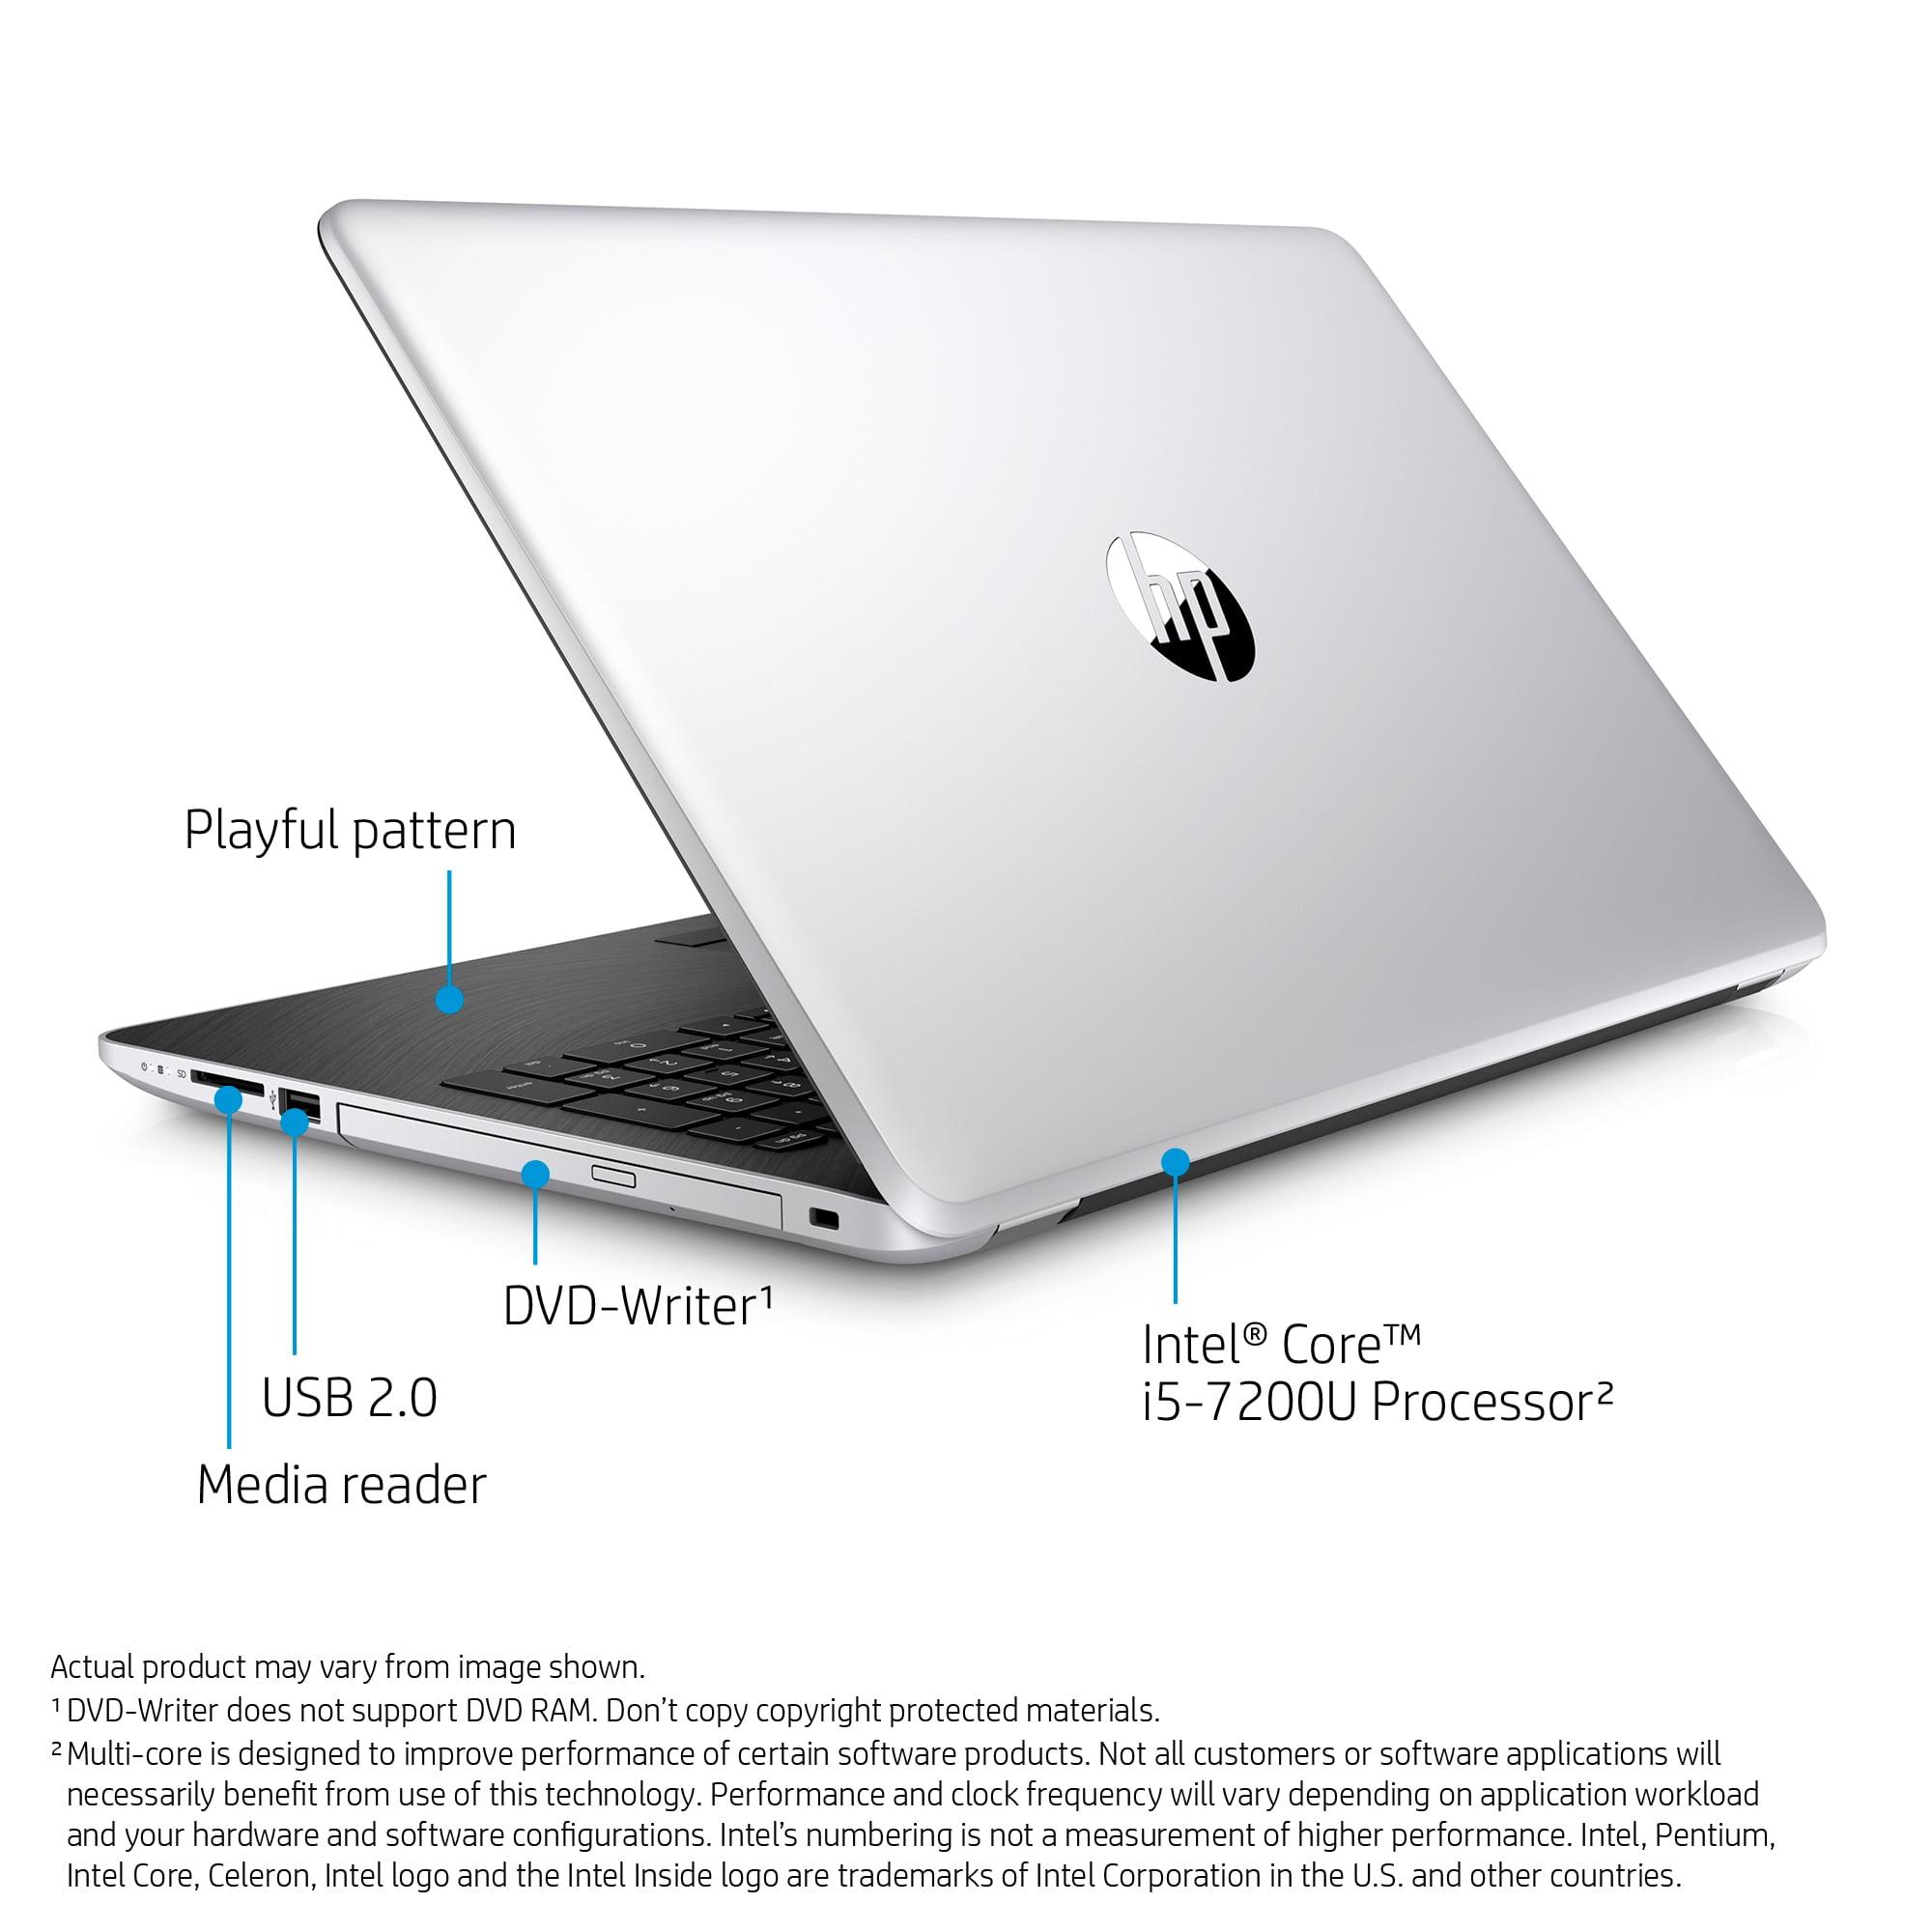 Hp Jaguar 15 Bs070wm 156 Natural Silver Touch Laptop Windows 10 Flashdisk 8gb Best Quality Intel Core I5 7200u Processor Memory 1tb Hard Drive